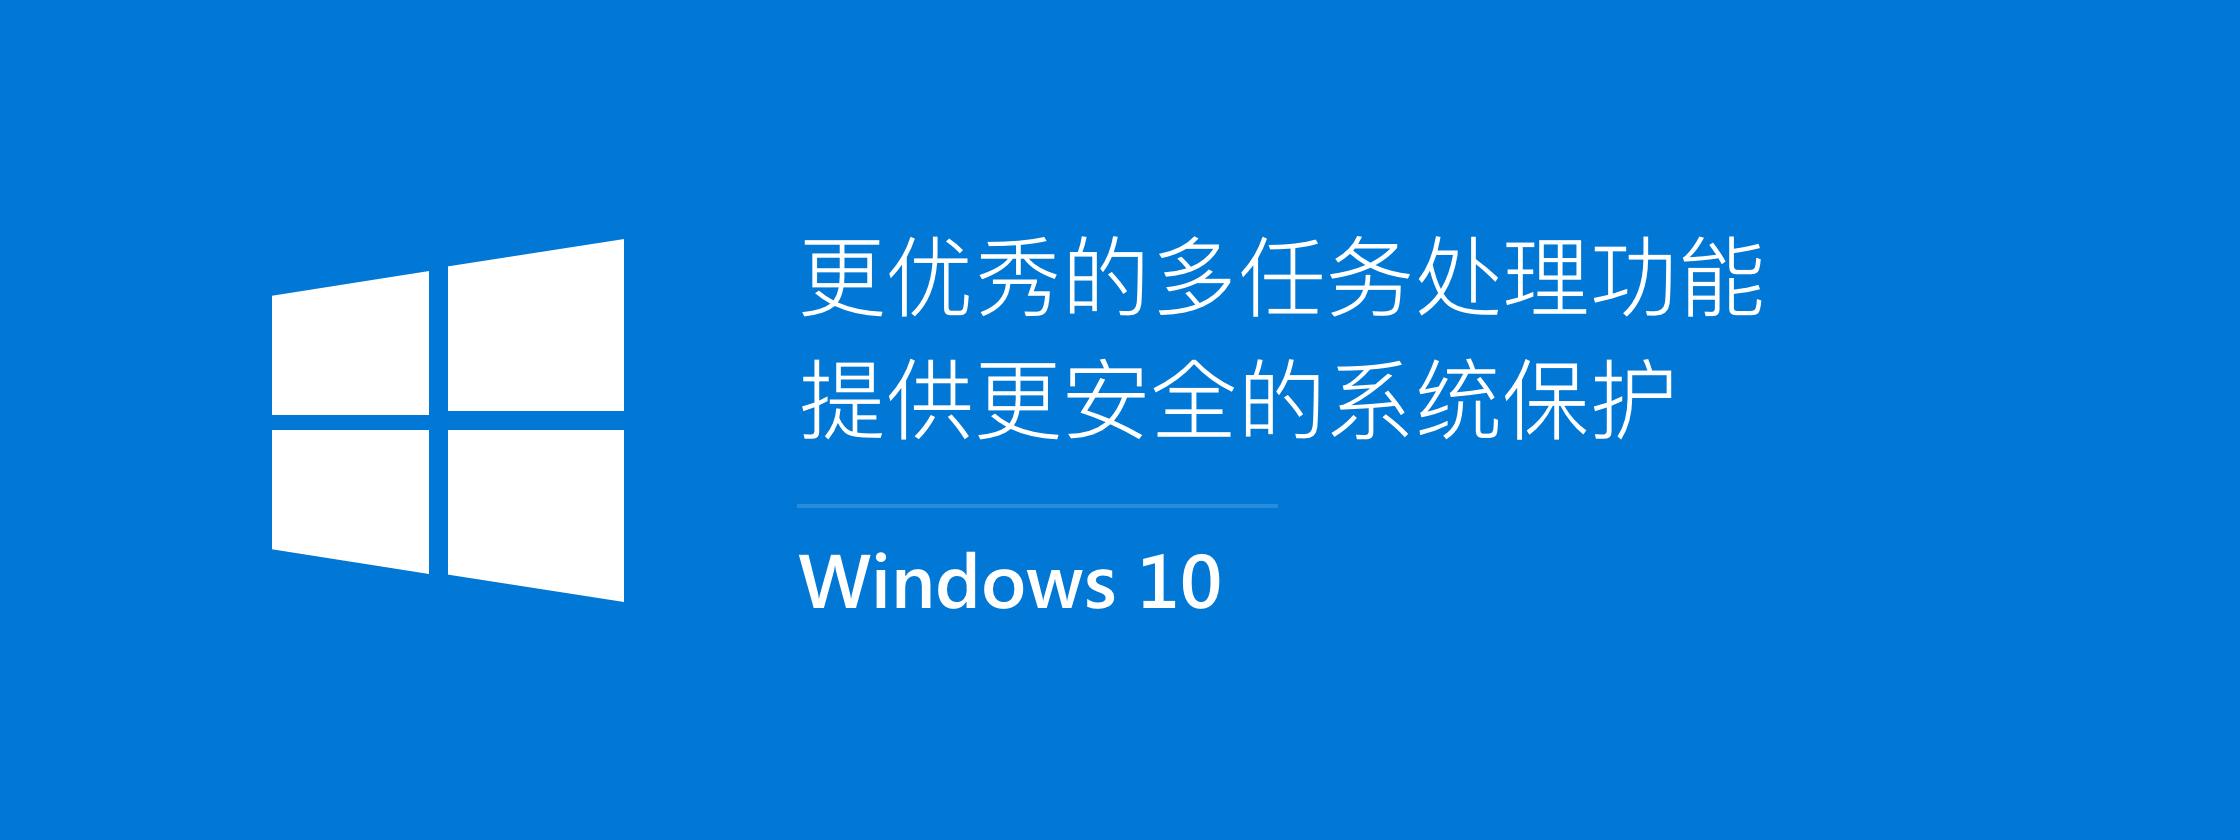 Windows 10,更优秀的多任务处理功能,提供更安全的系统保护